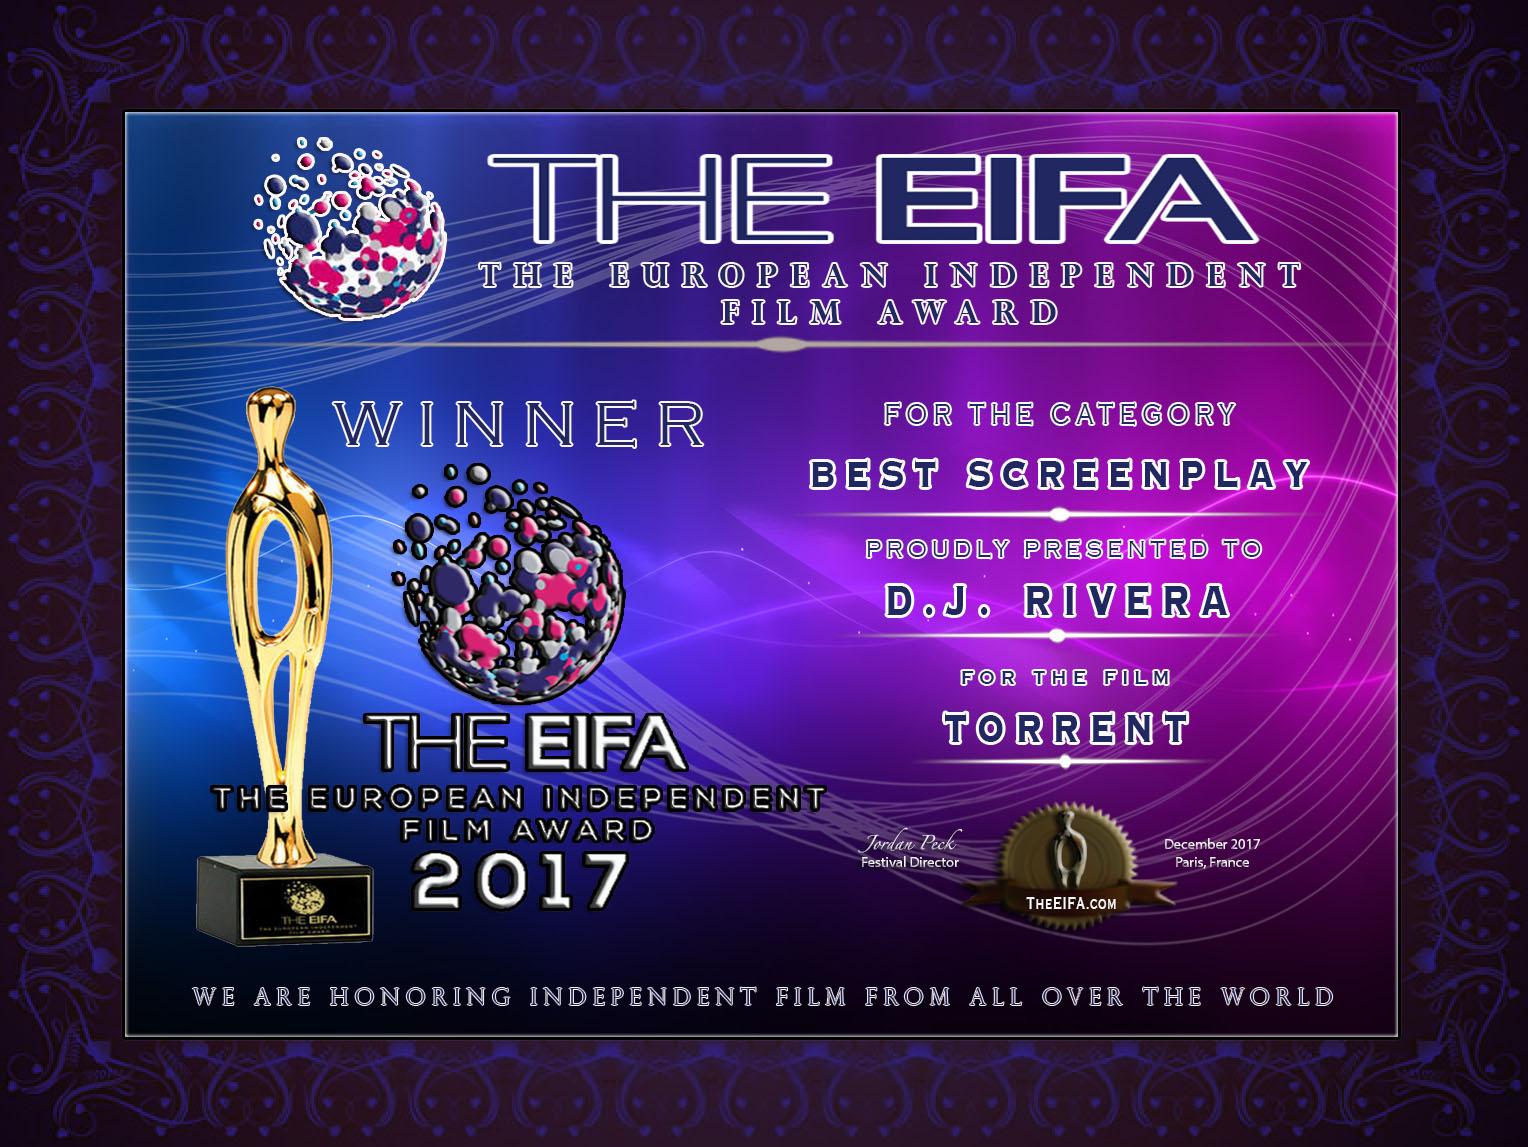 EIFA Best Screenplay Award